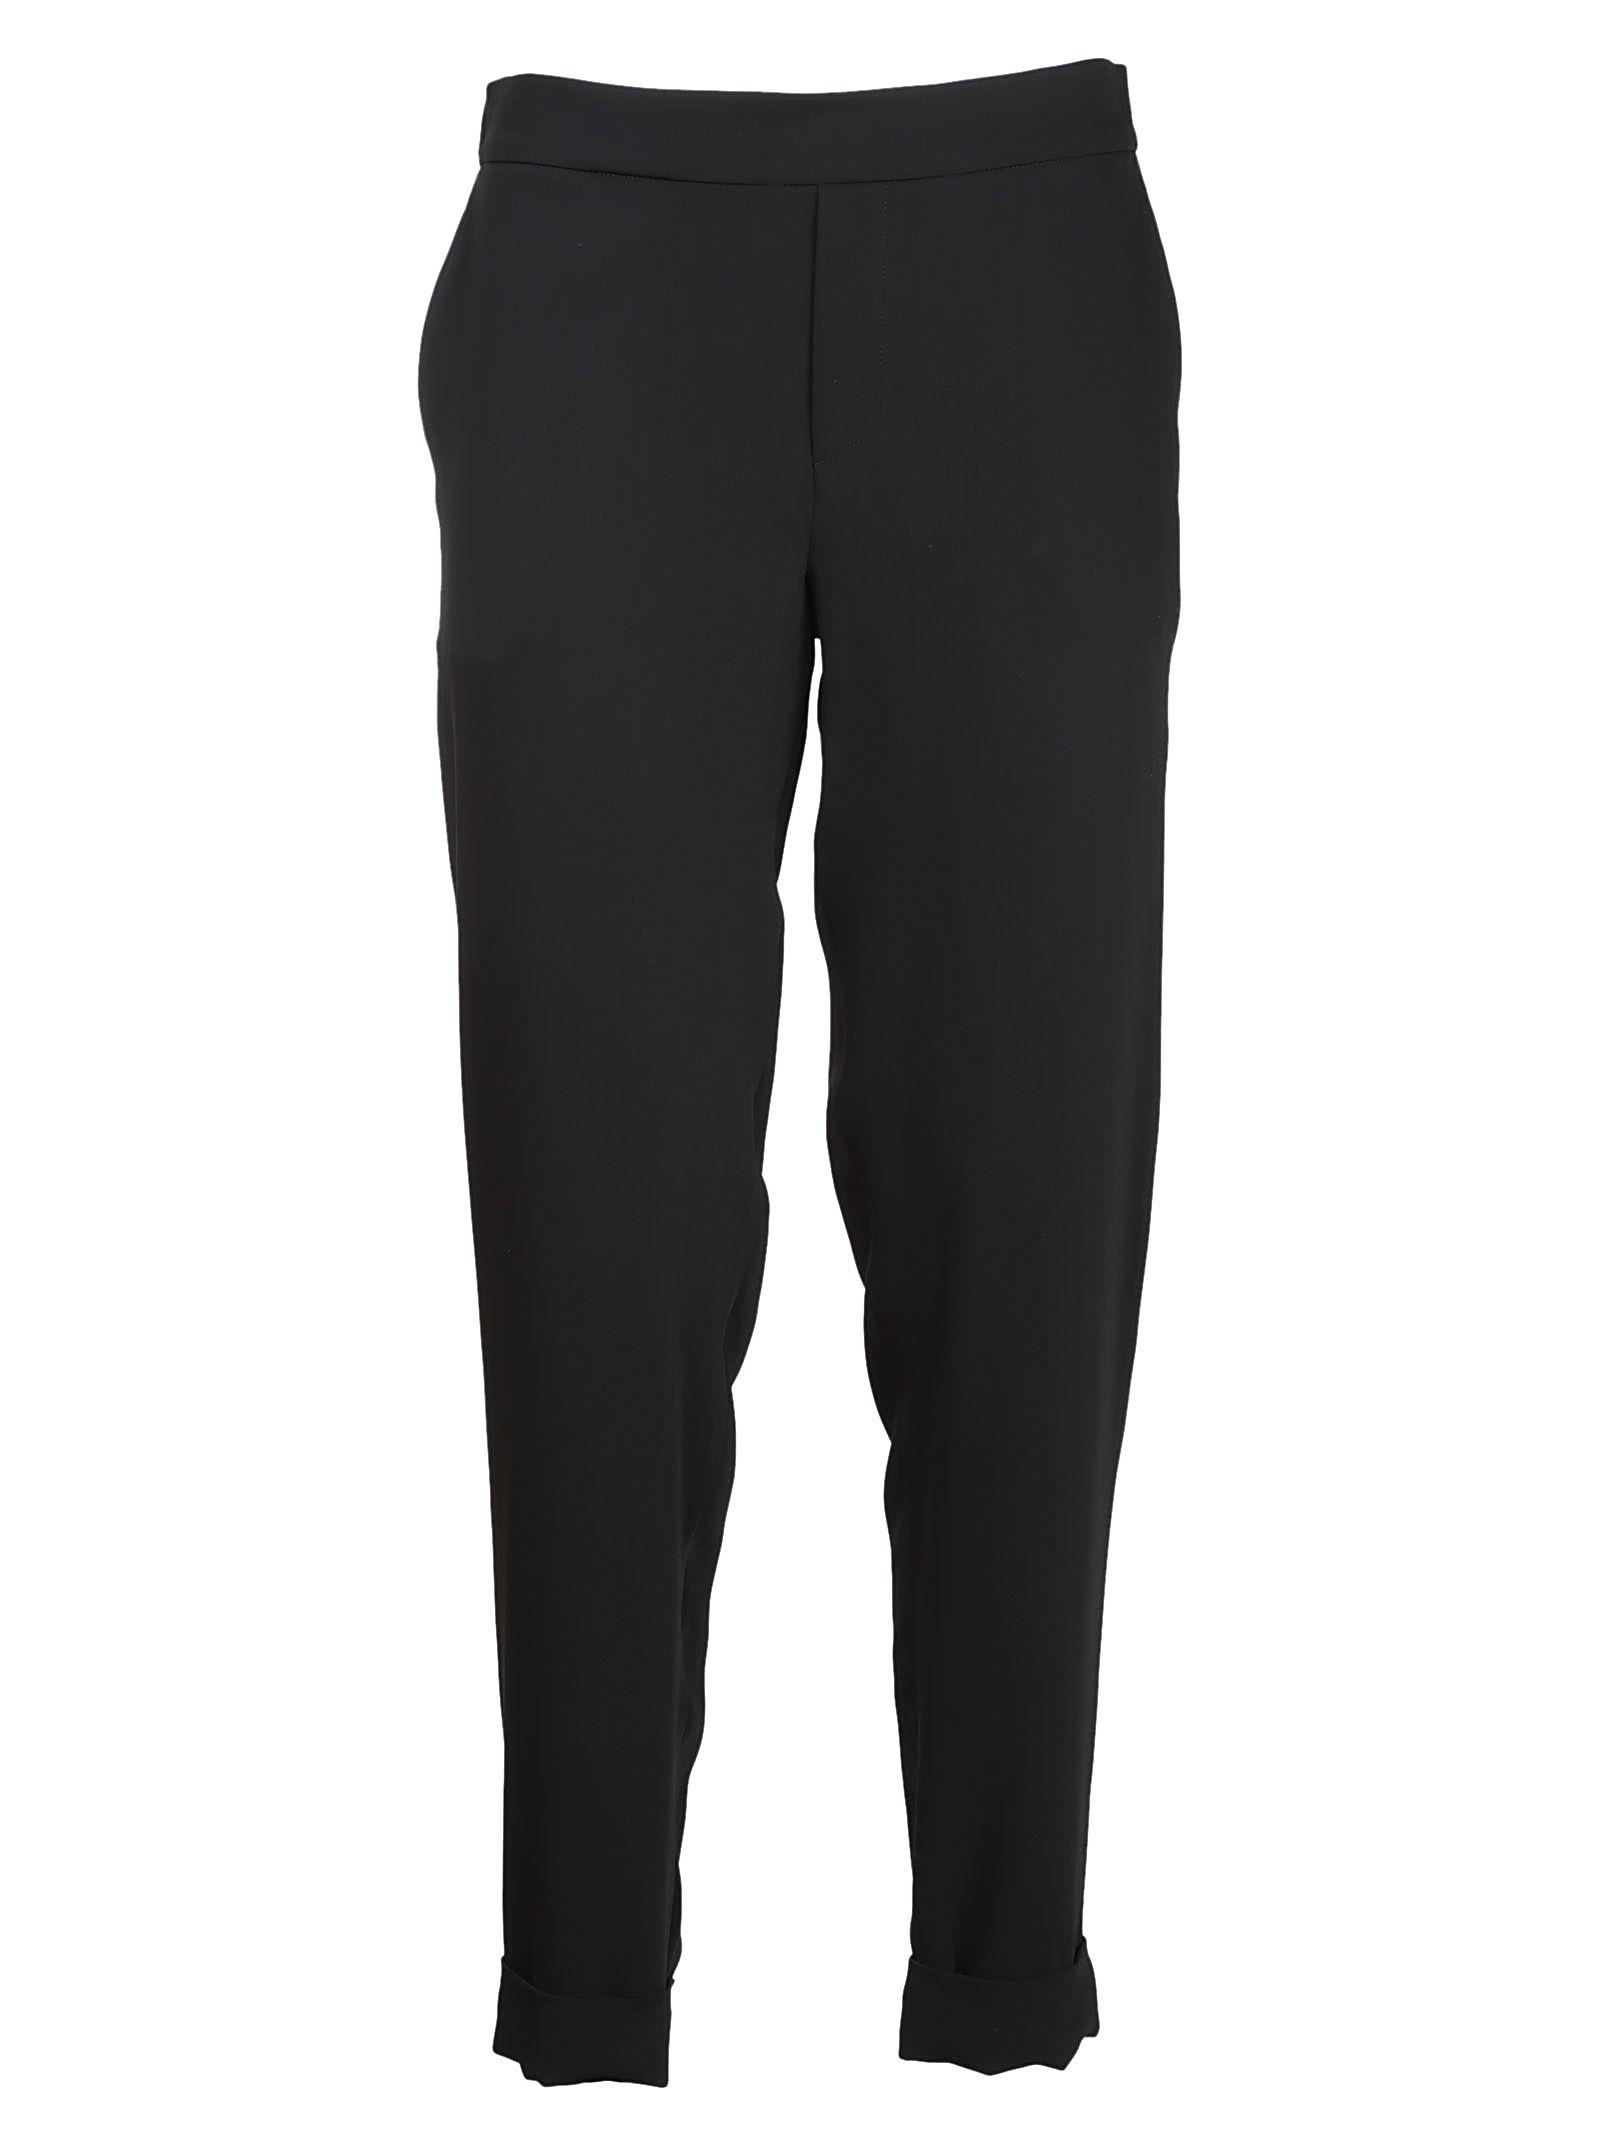 Parosh Pantera Trousers